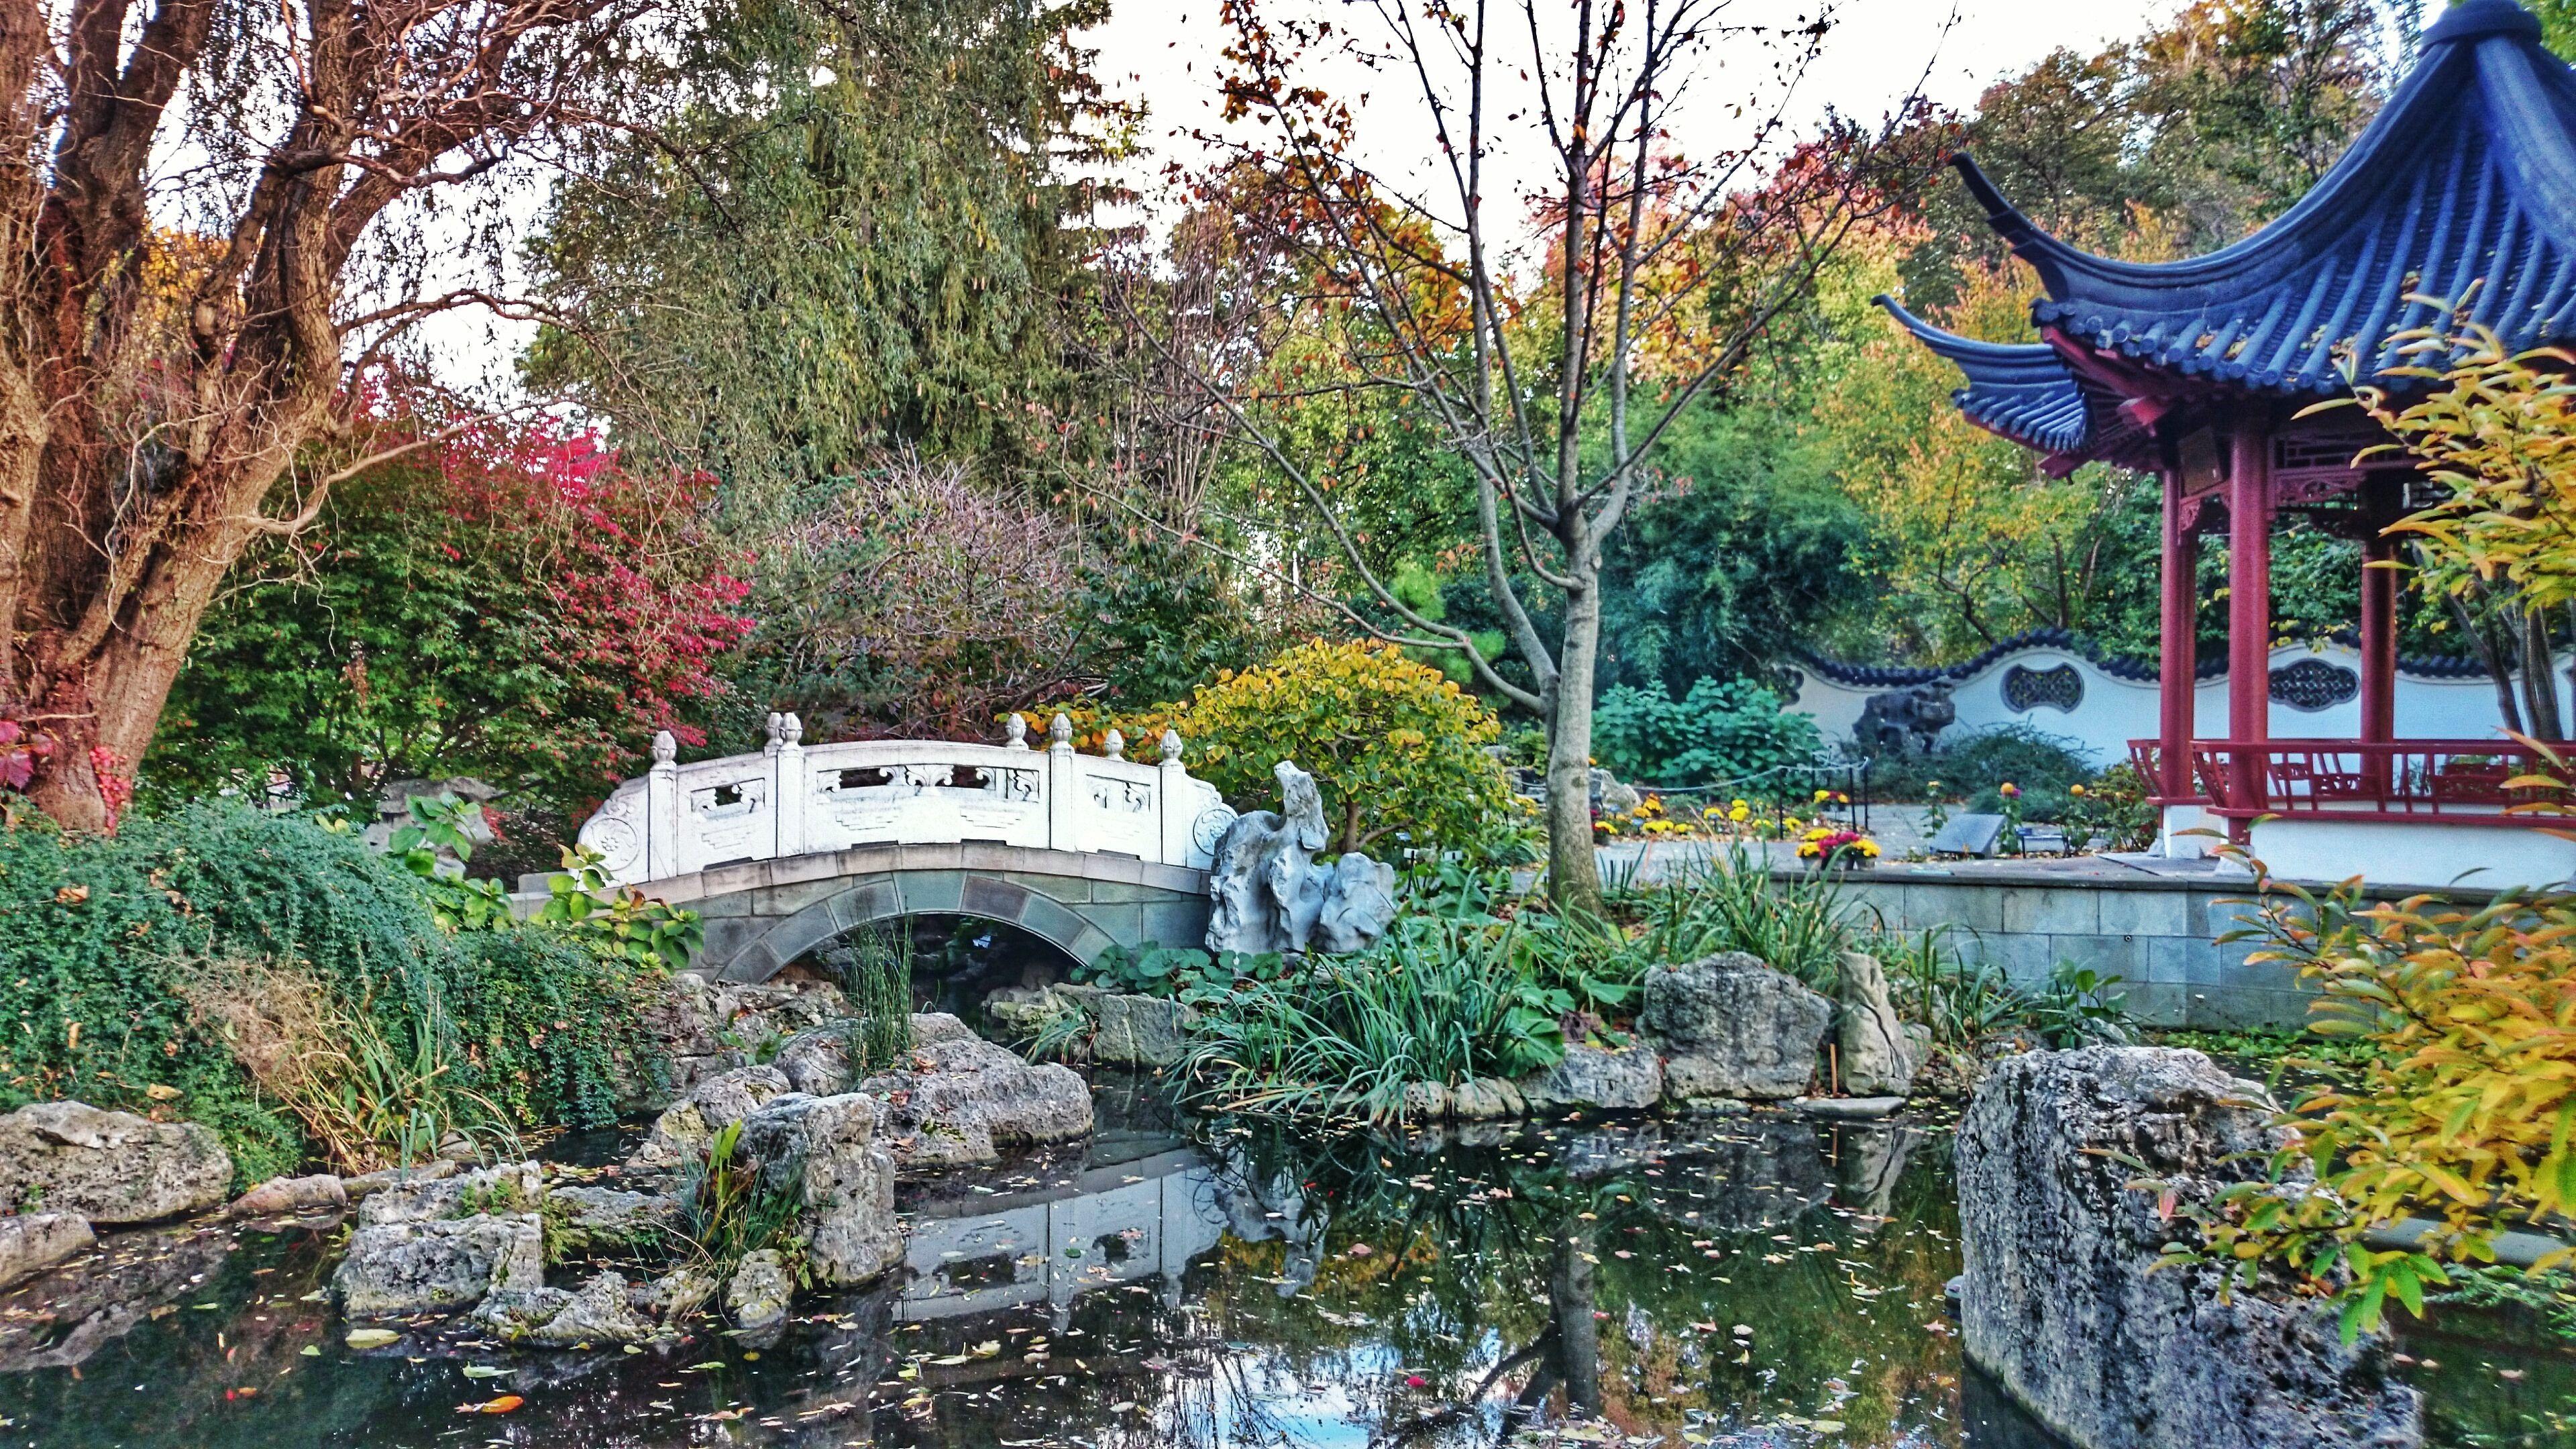 6dff7f84b84cb71967f8b1d4aa9091ac - Best Time To Visit Missouri Botanical Gardens